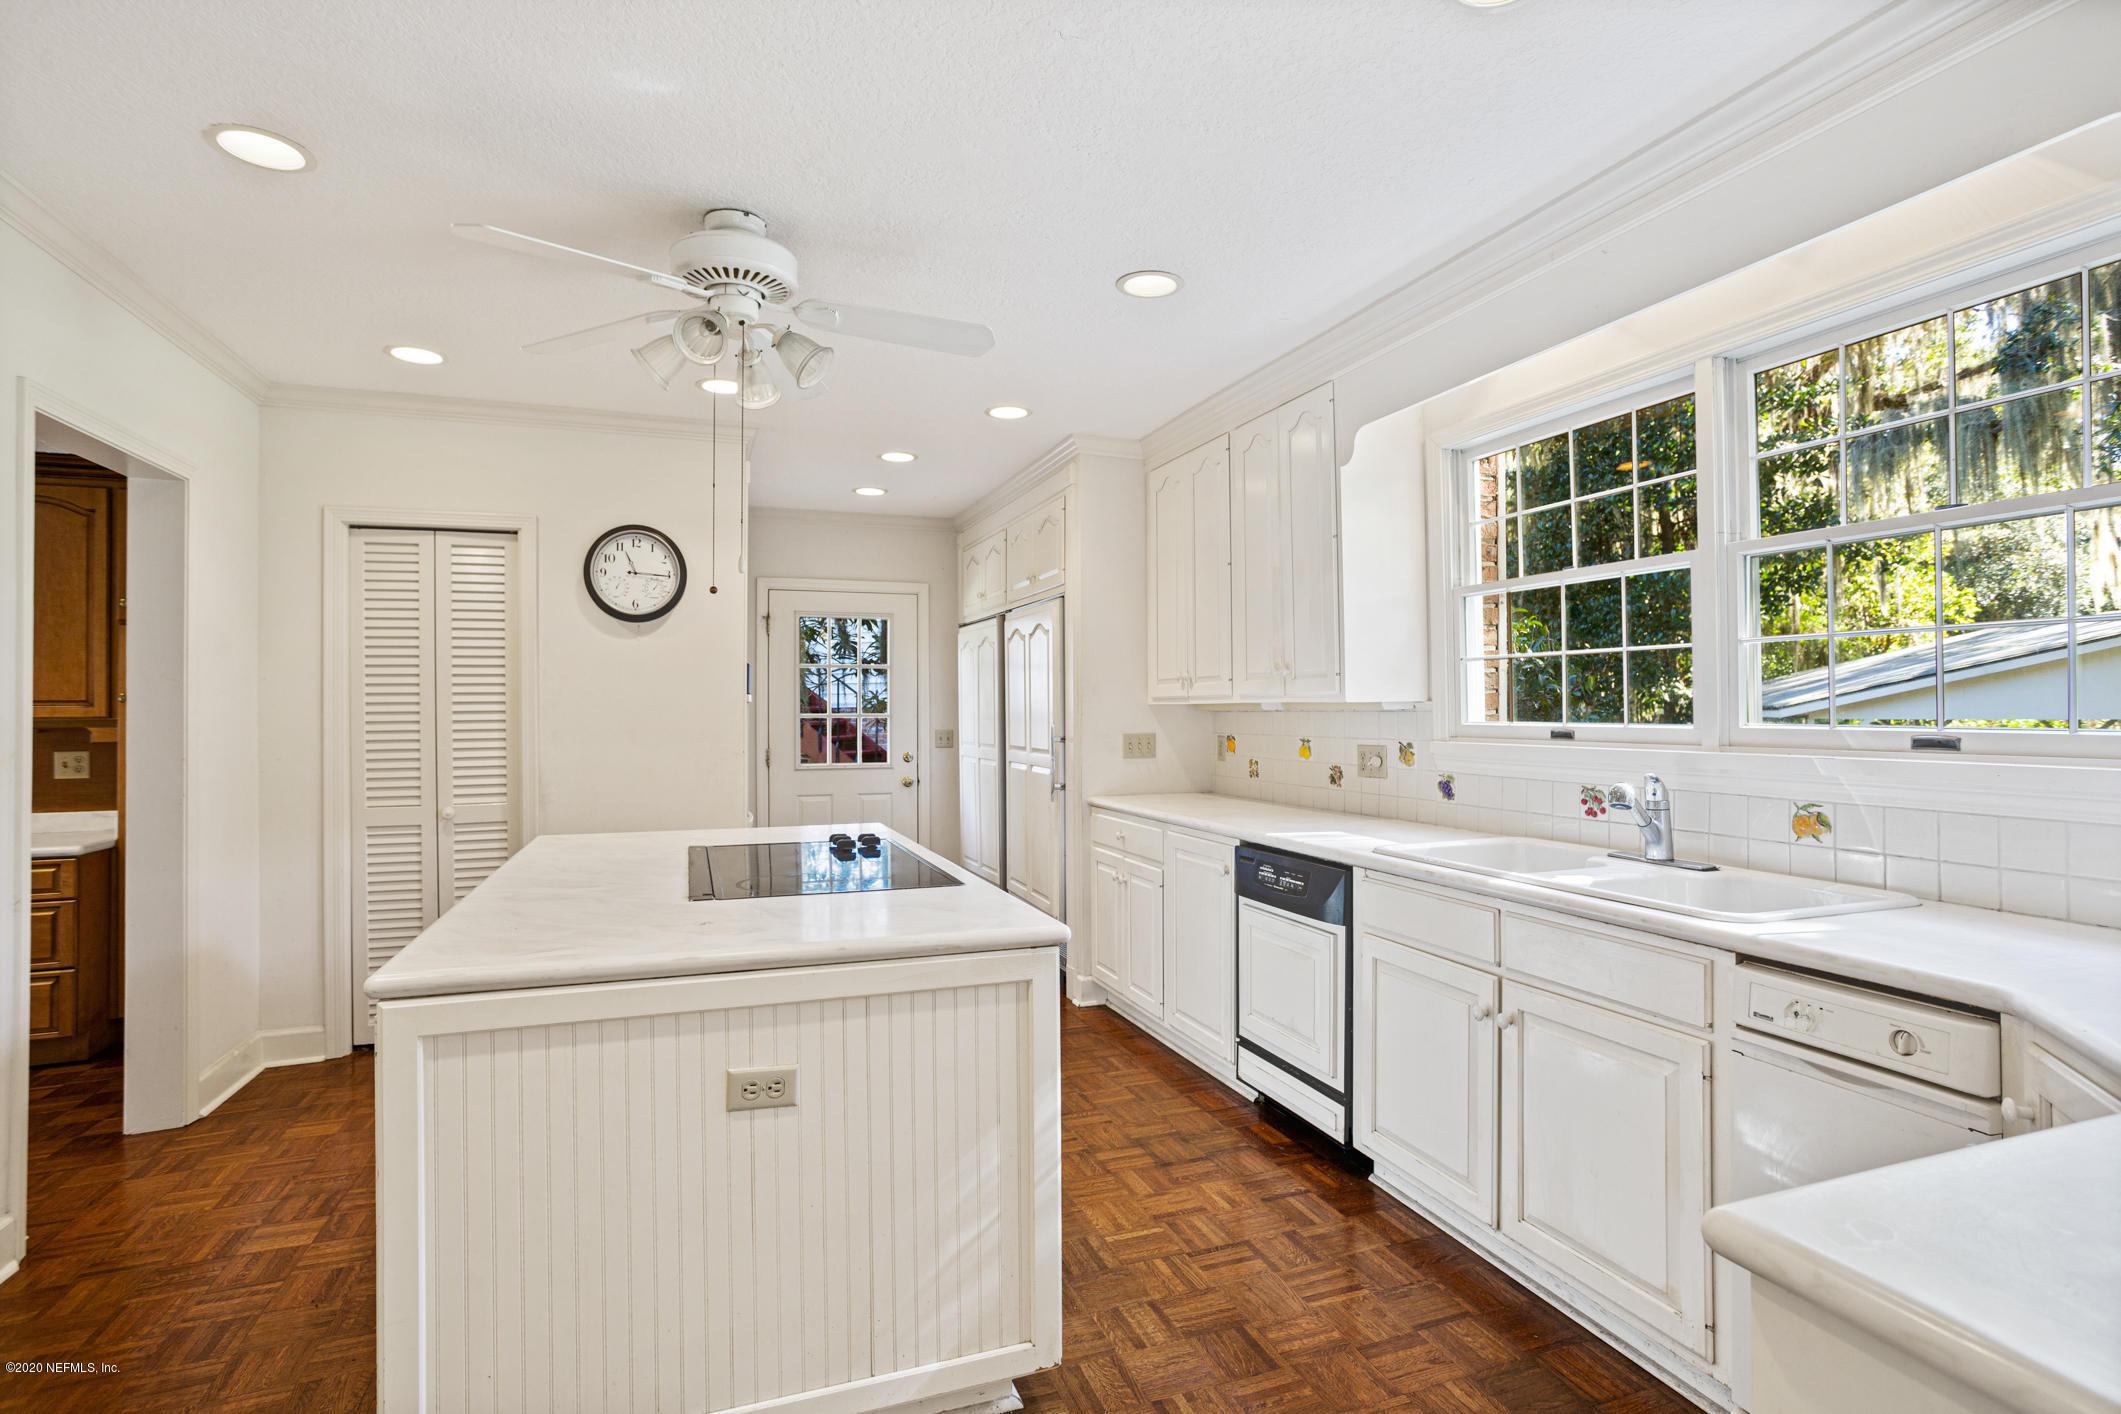 11912 MANDARIN, JACKSONVILLE, FLORIDA 32223, 5 Bedrooms Bedrooms, ,3 BathroomsBathrooms,Residential,For sale,MANDARIN,1081650